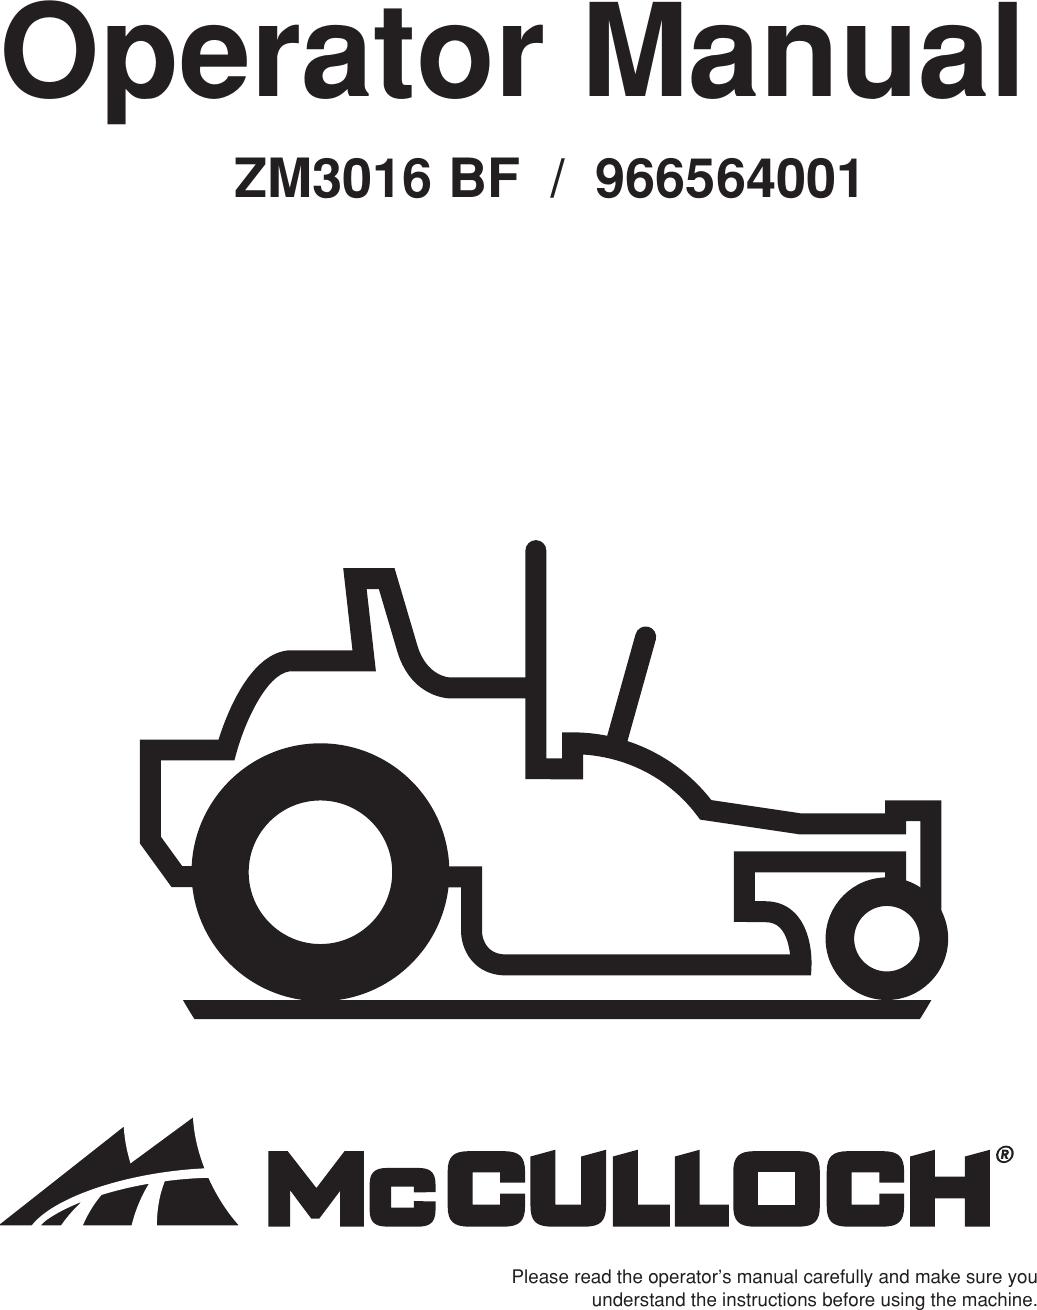 Mcculloch 966564001 Operators Manual OM, ZM3016 BF, 2010